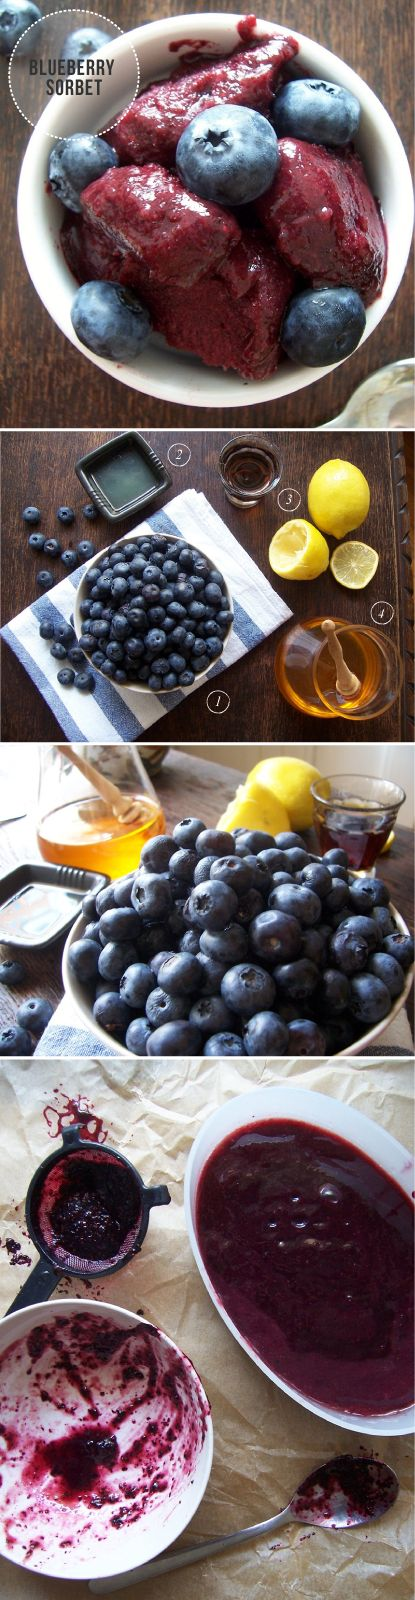 Homemade blueberry sorbet (with honey and lemon)